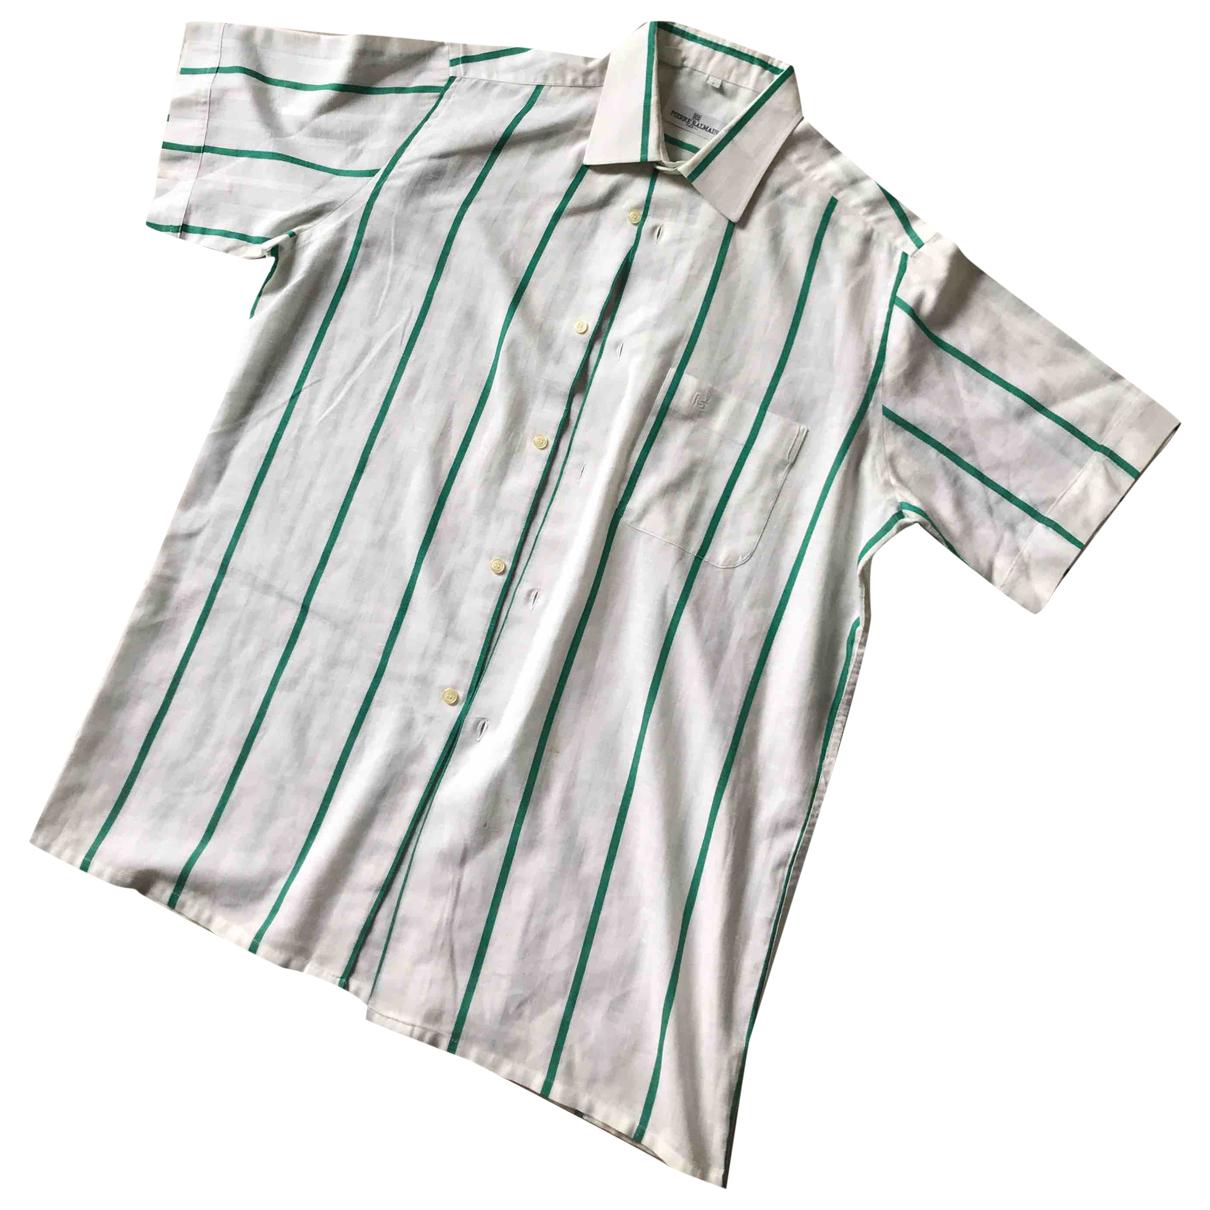 Pierre Balmain \N White Cotton Shirts for Men 43 EU (tour de cou / collar)